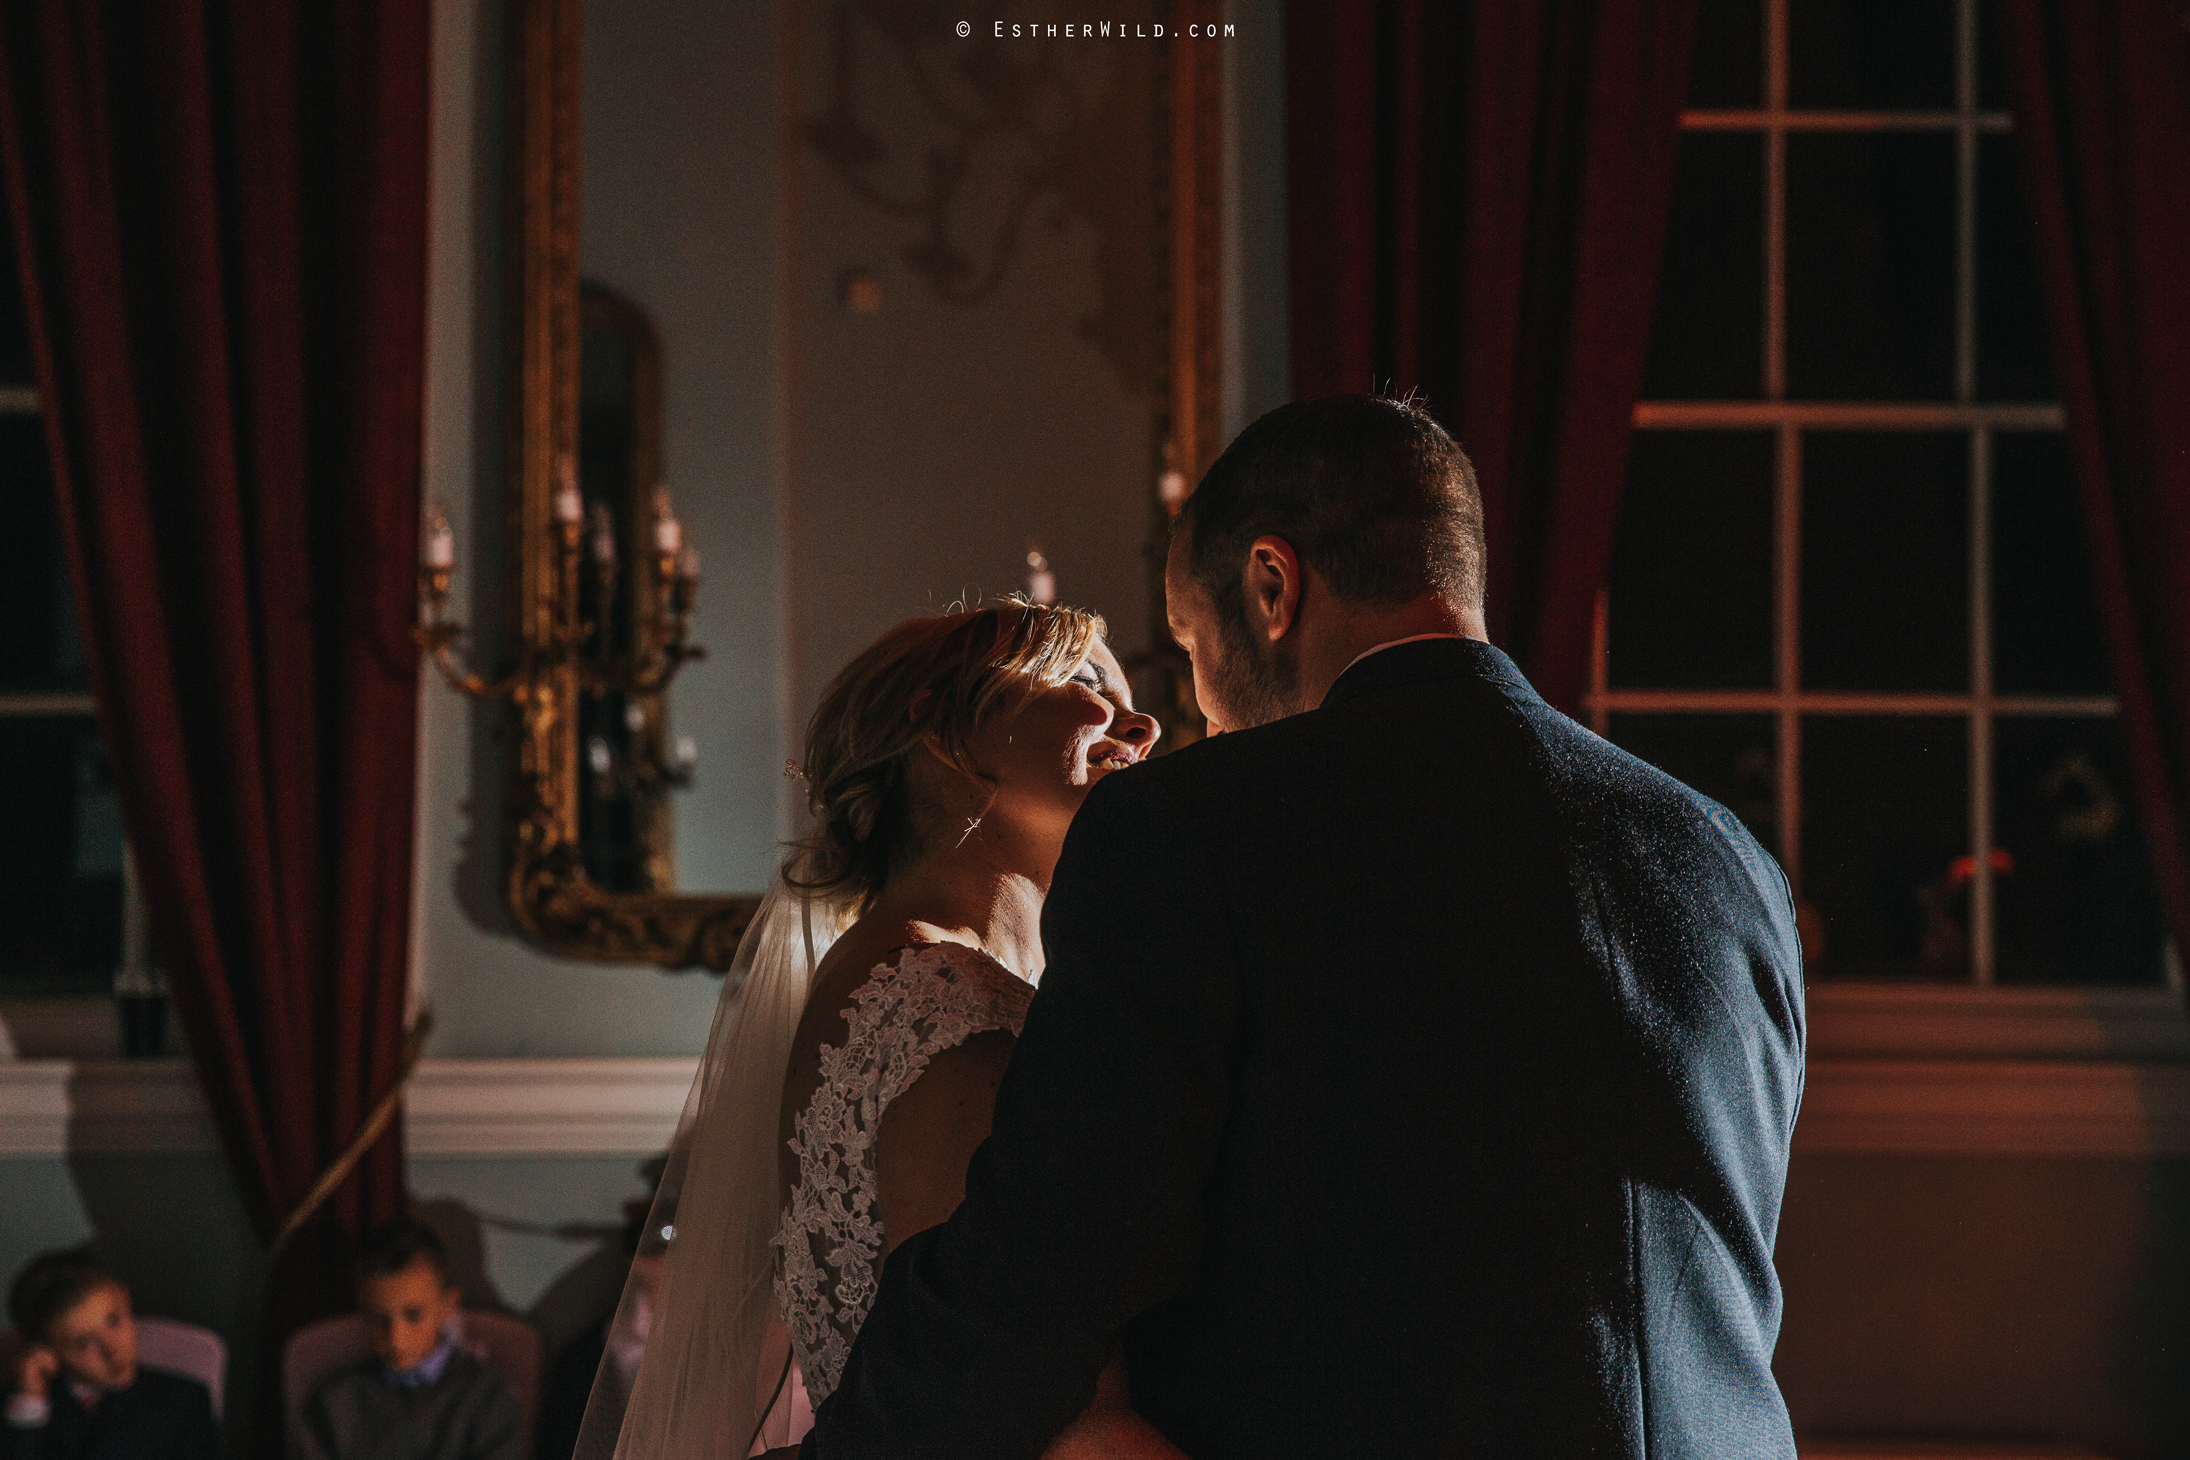 Wedding_Kings_Lynn_Town_Hall_Norfolk_Photographer_Esther_Wild_IMG_1825_IMGL0815.jpg